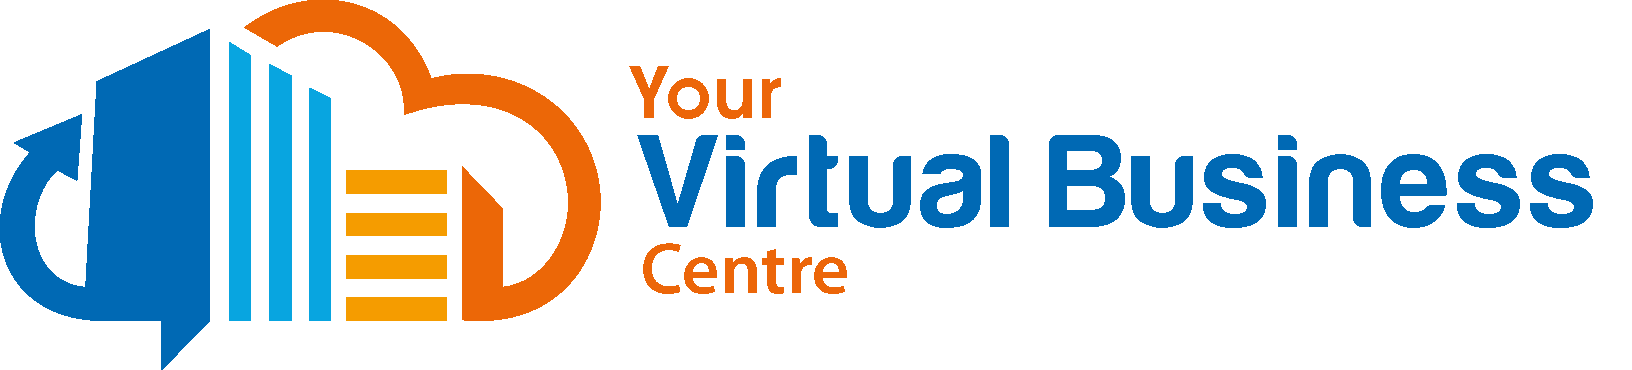 Your Virtual Business Centre WA Pty Ltd